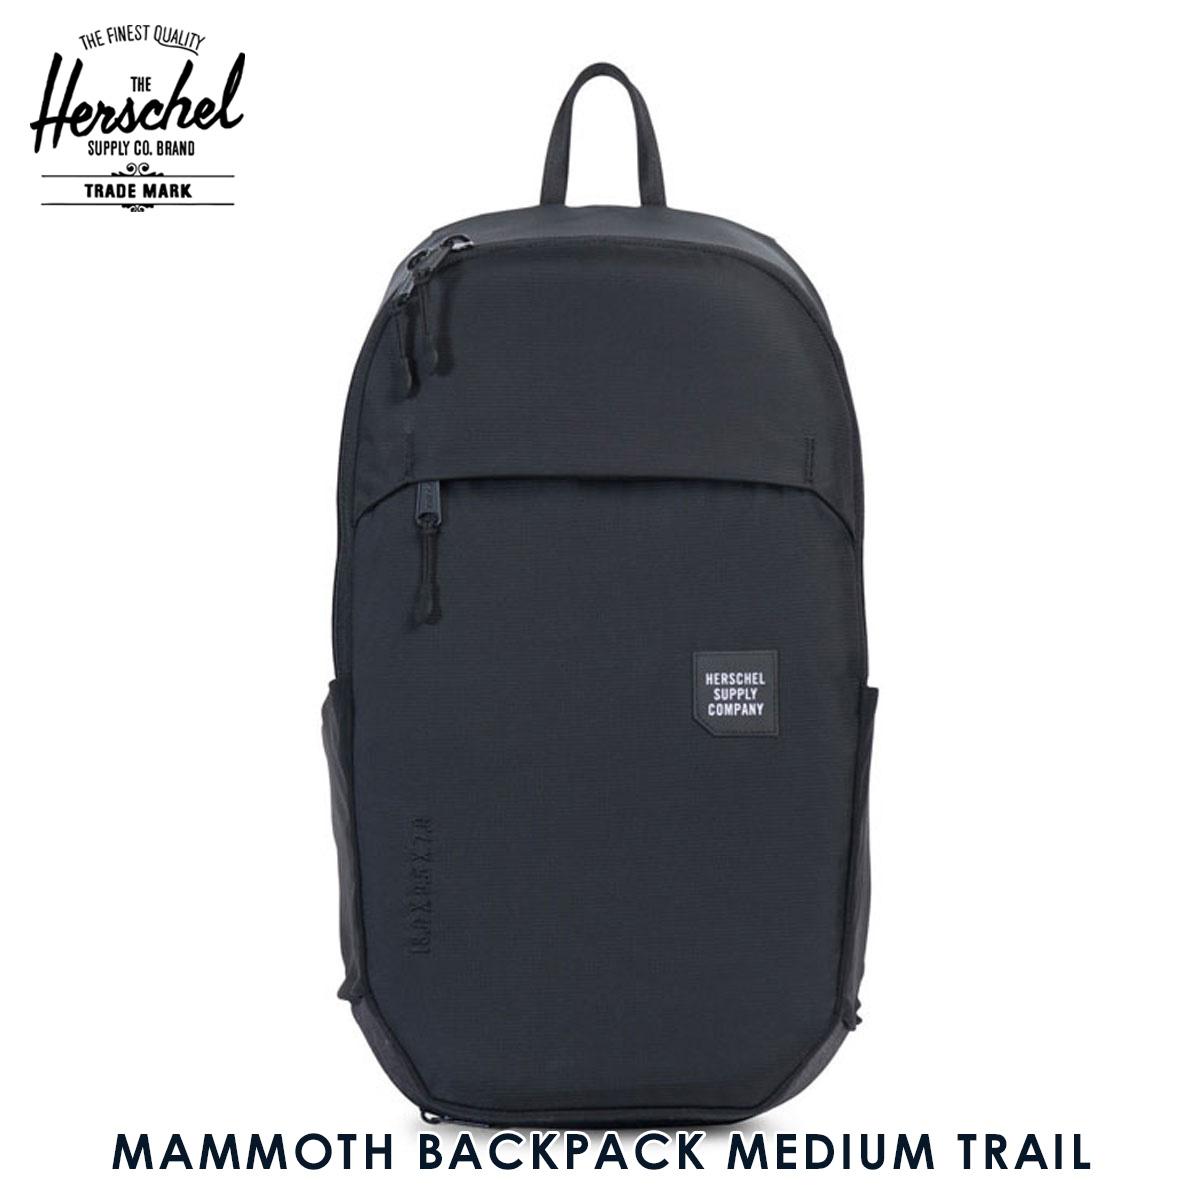 c0b5e20e5b9 Hershel supply Herschel Supply regular store bag MAMMOTH BACKPACK MEDIUM  TRAIL 10269-01174-OS BLACK D00S15